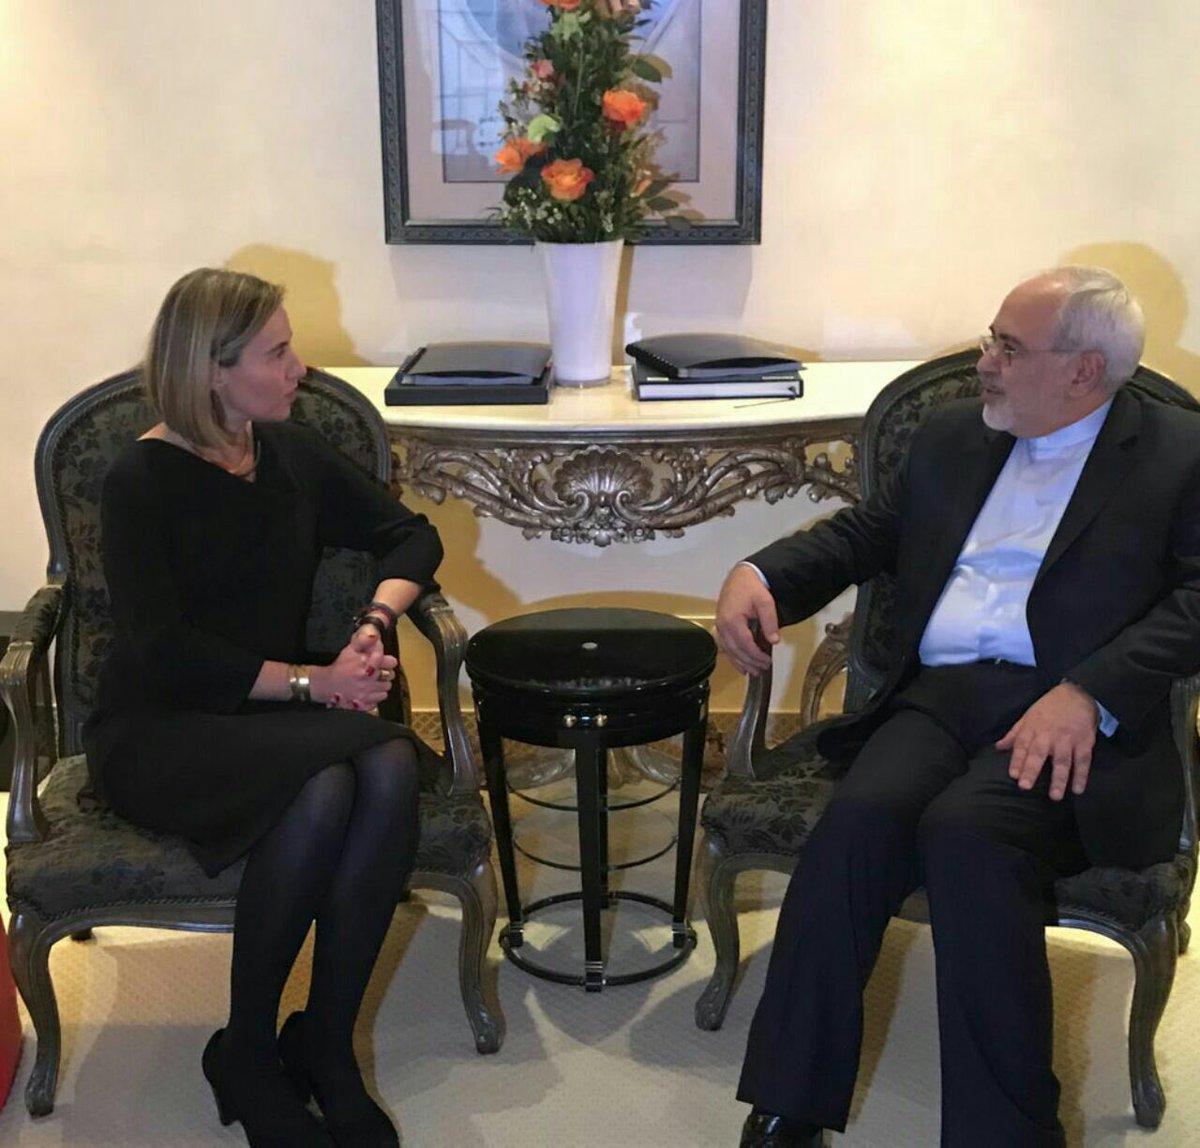 #Iran FM @JZarif met #EU FP chief @FedericaMog, #Russia FM Lavrov, #Turkey FM @MevlutCavusoglu &amp; #France FM @jeanmarcayrault in #Munich.<br>http://pic.twitter.com/eZmzJb6qM0